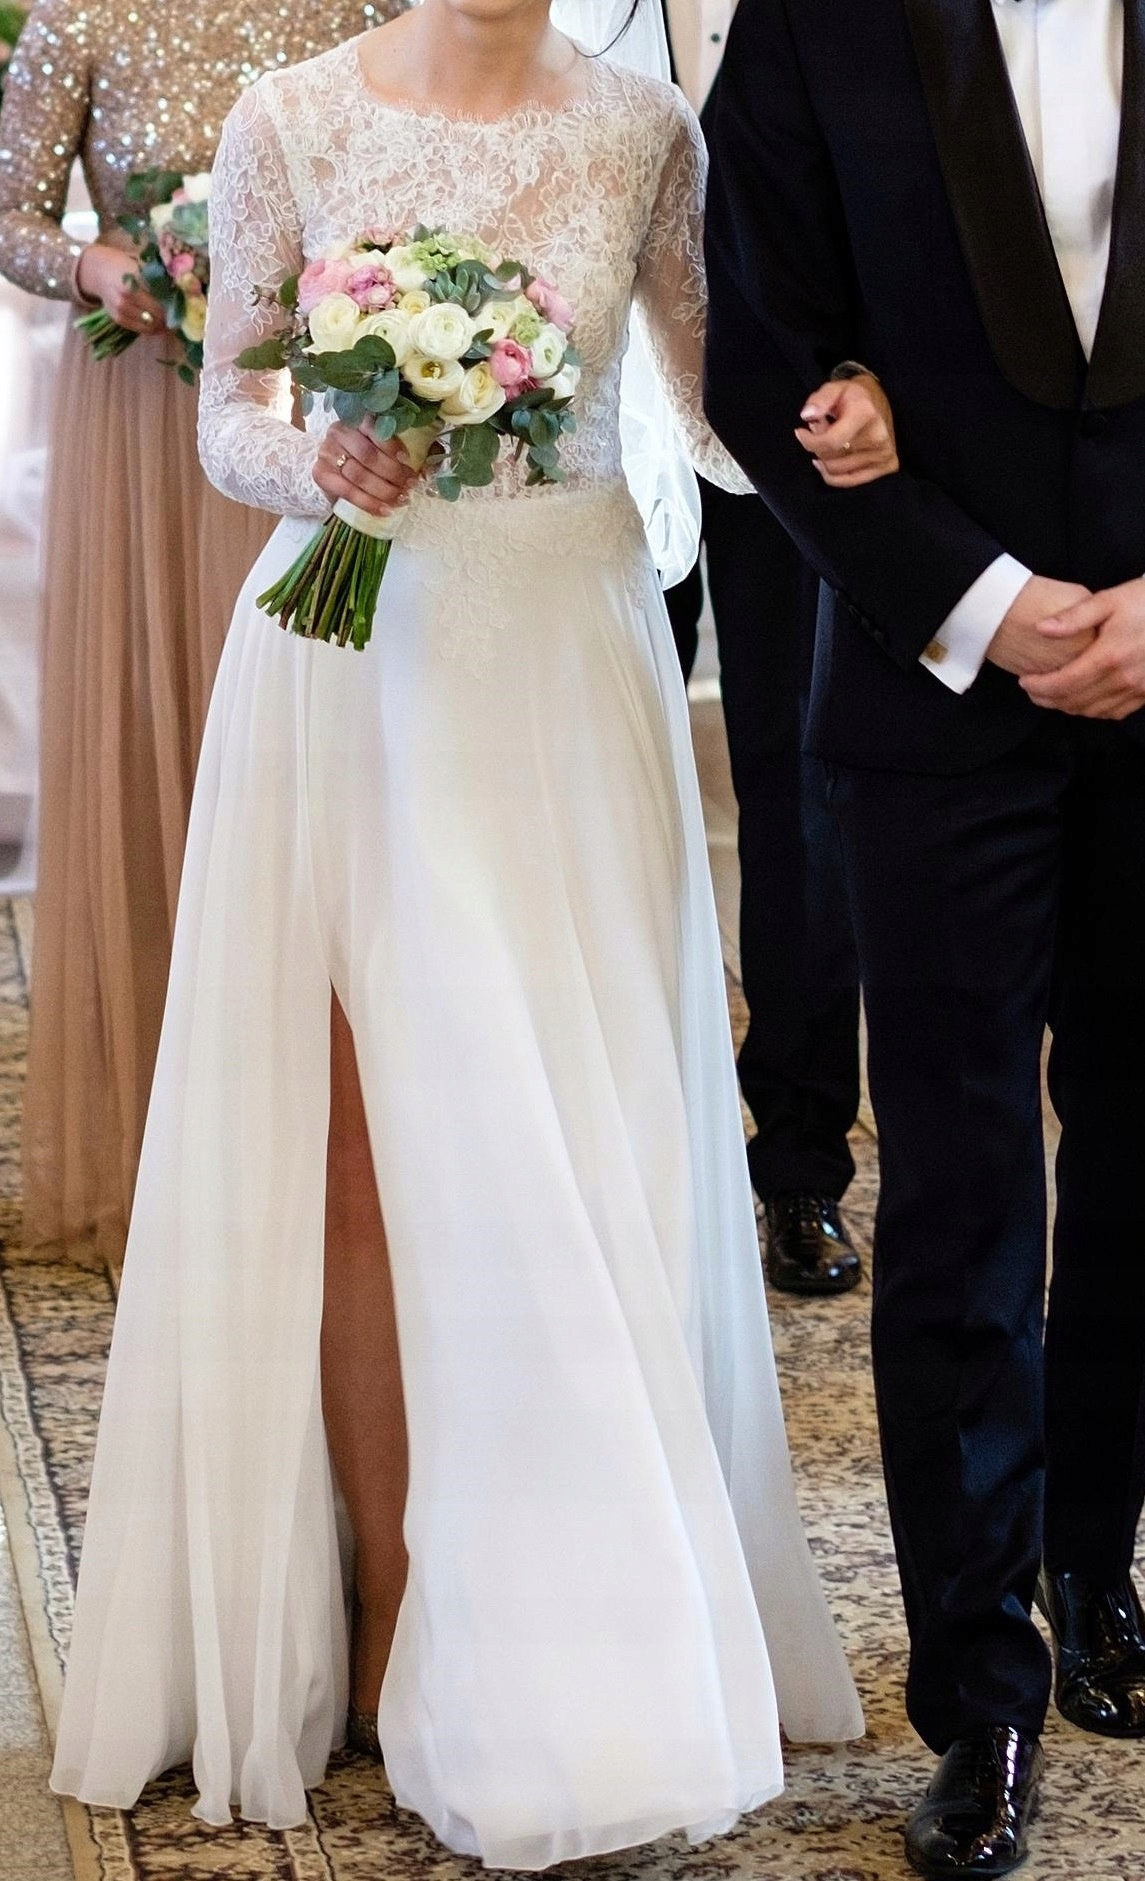 Suknia ślubna Julia Gastoł Atelier Koronkamuślin 7495579114